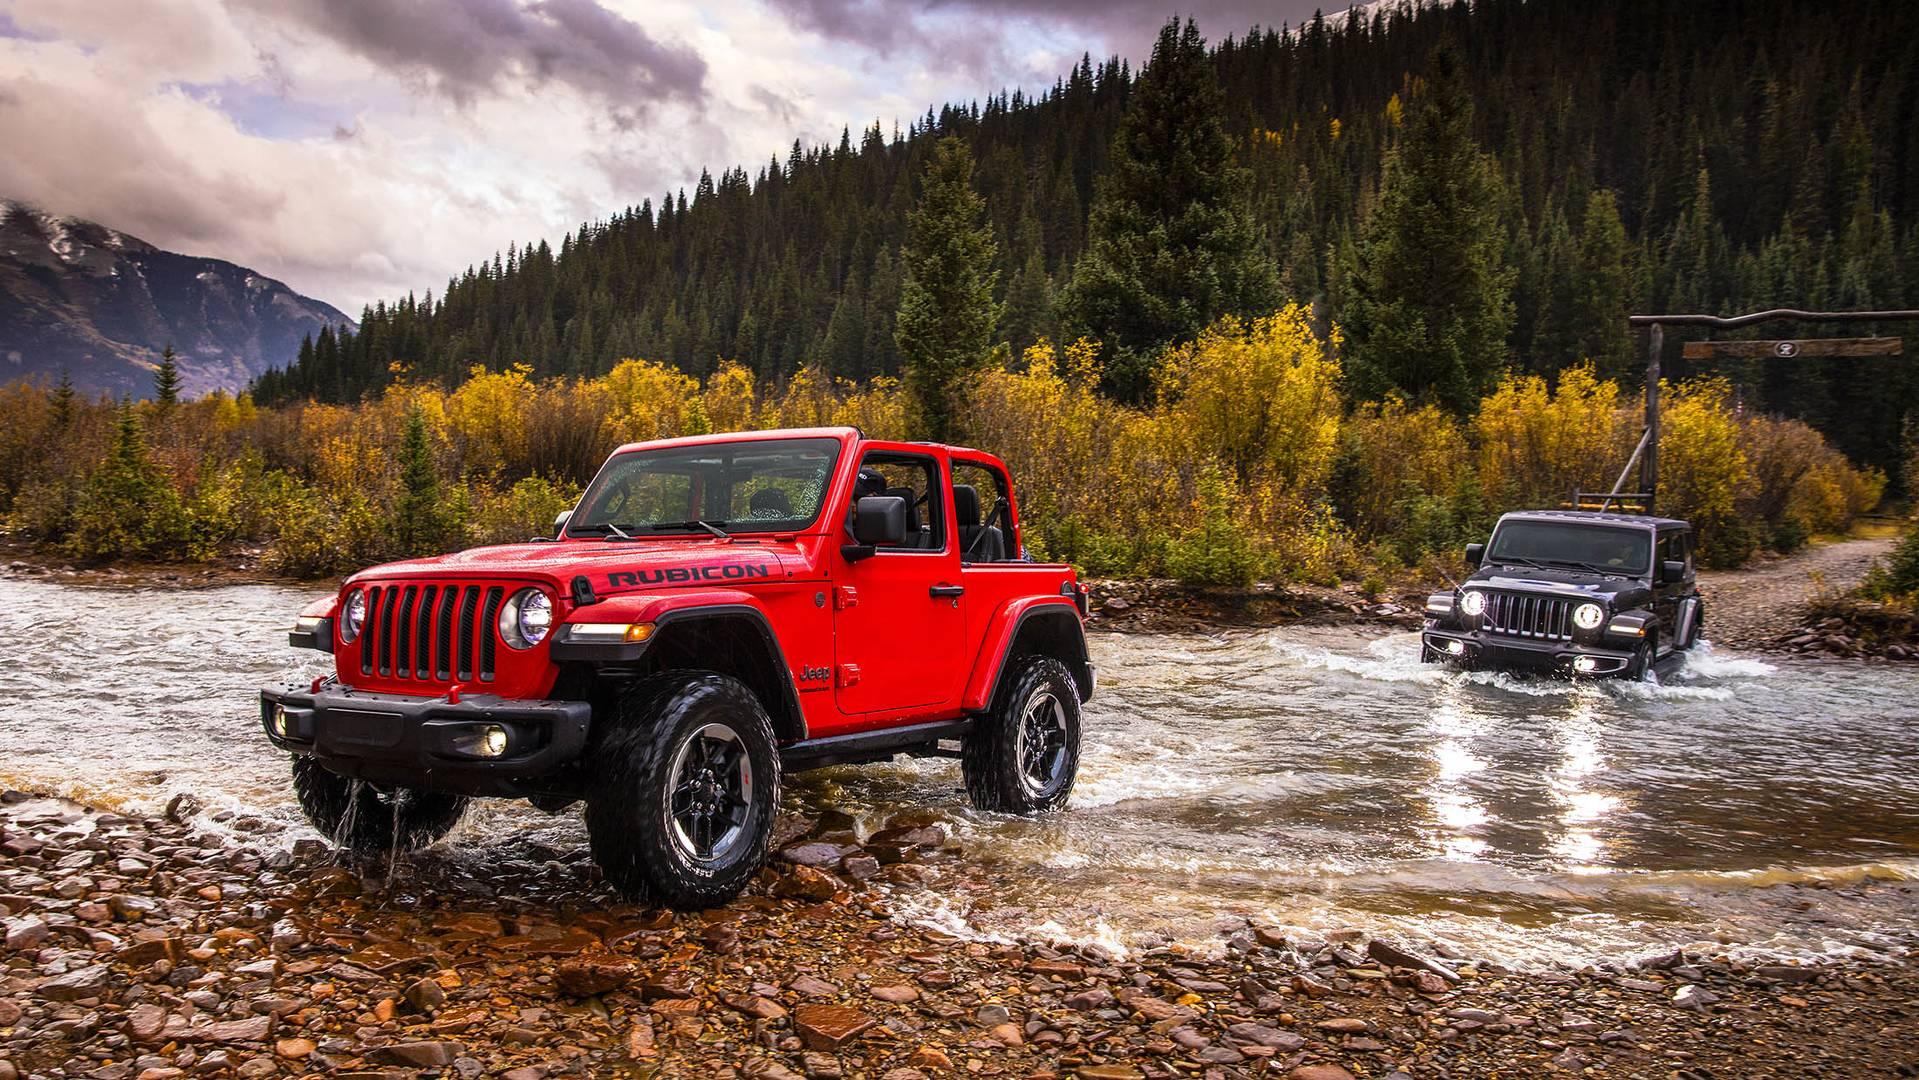 2018 Jeep Wrangler Price List Jl Starts At 26 995 Jlu At 30 495